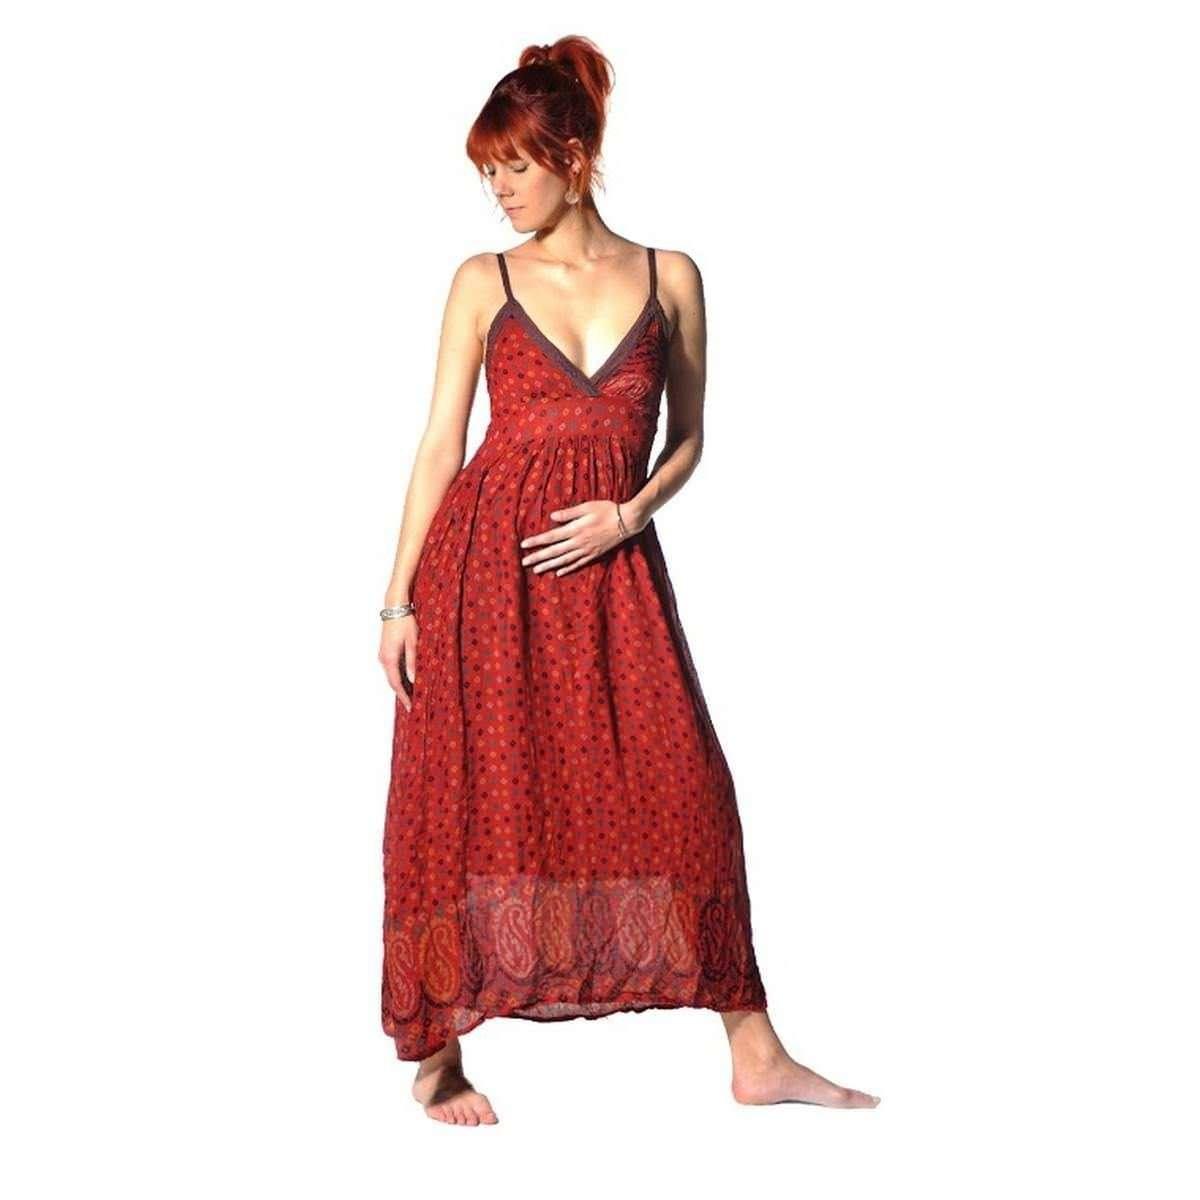 Kleid Trägerkleid Maxikleid Abendkleid Sommer Kleider